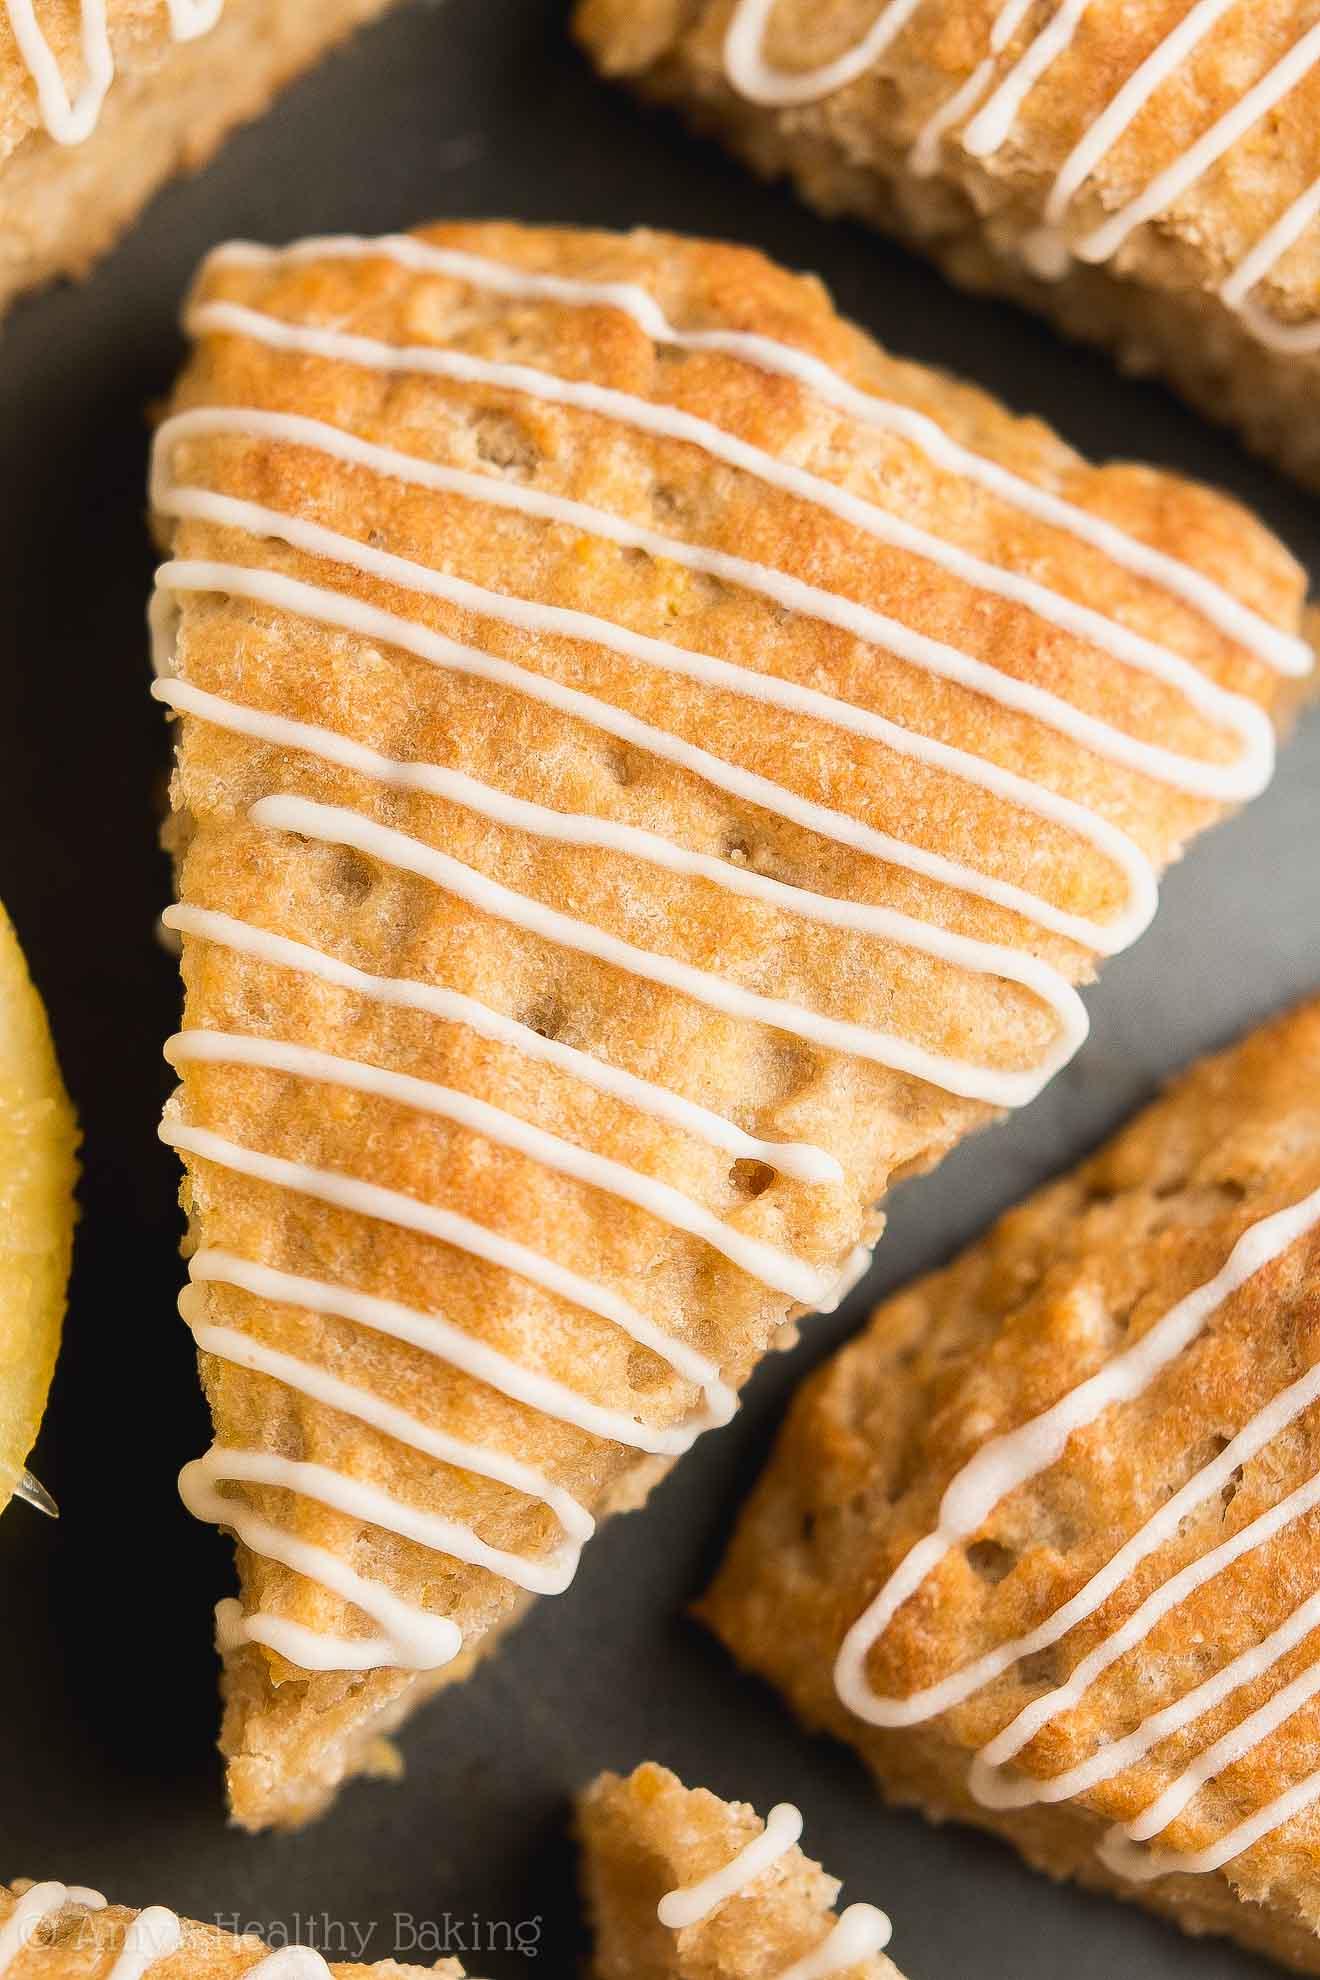 Gluten-Free Healthy Lemon Scones with Lemon Drizzle